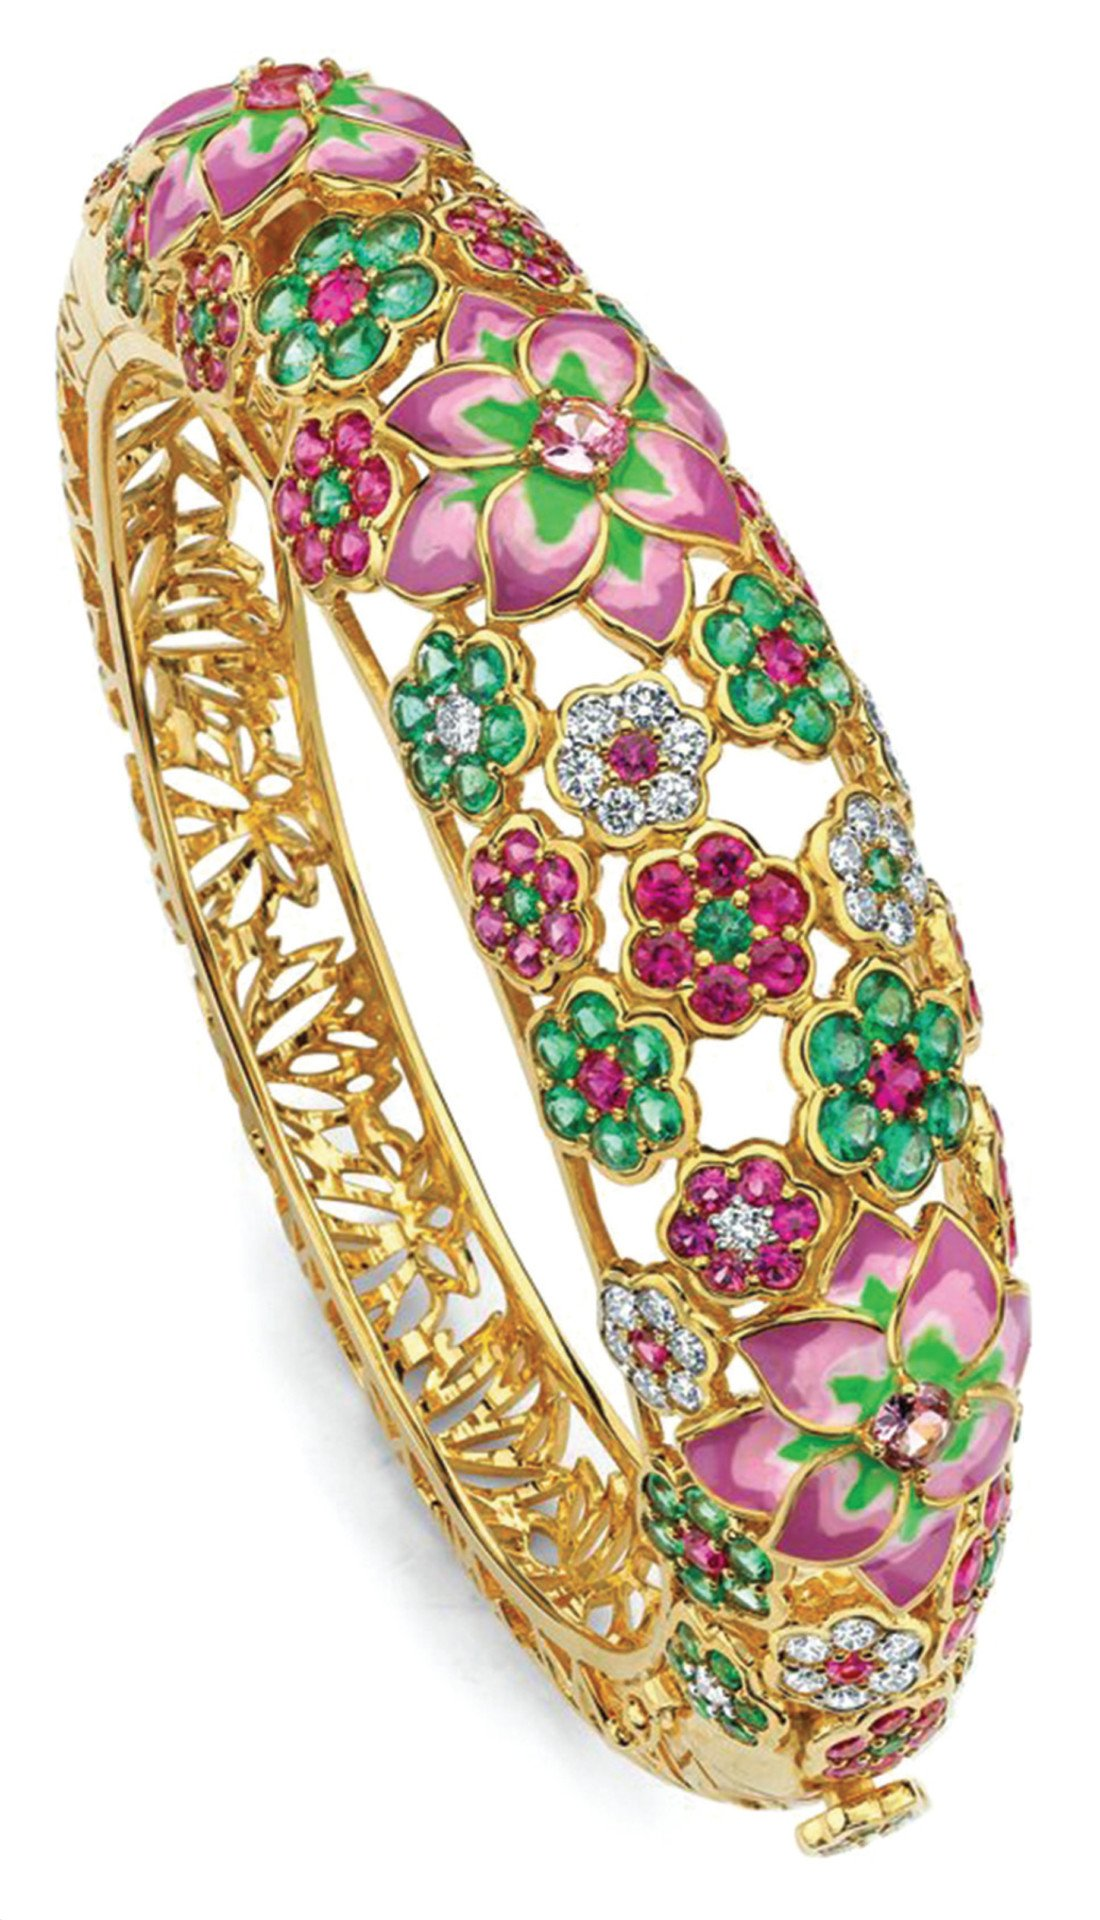 6d152daff0b16 2017 Top Jewelry Trends - Ganoksin Jewelry Making Community